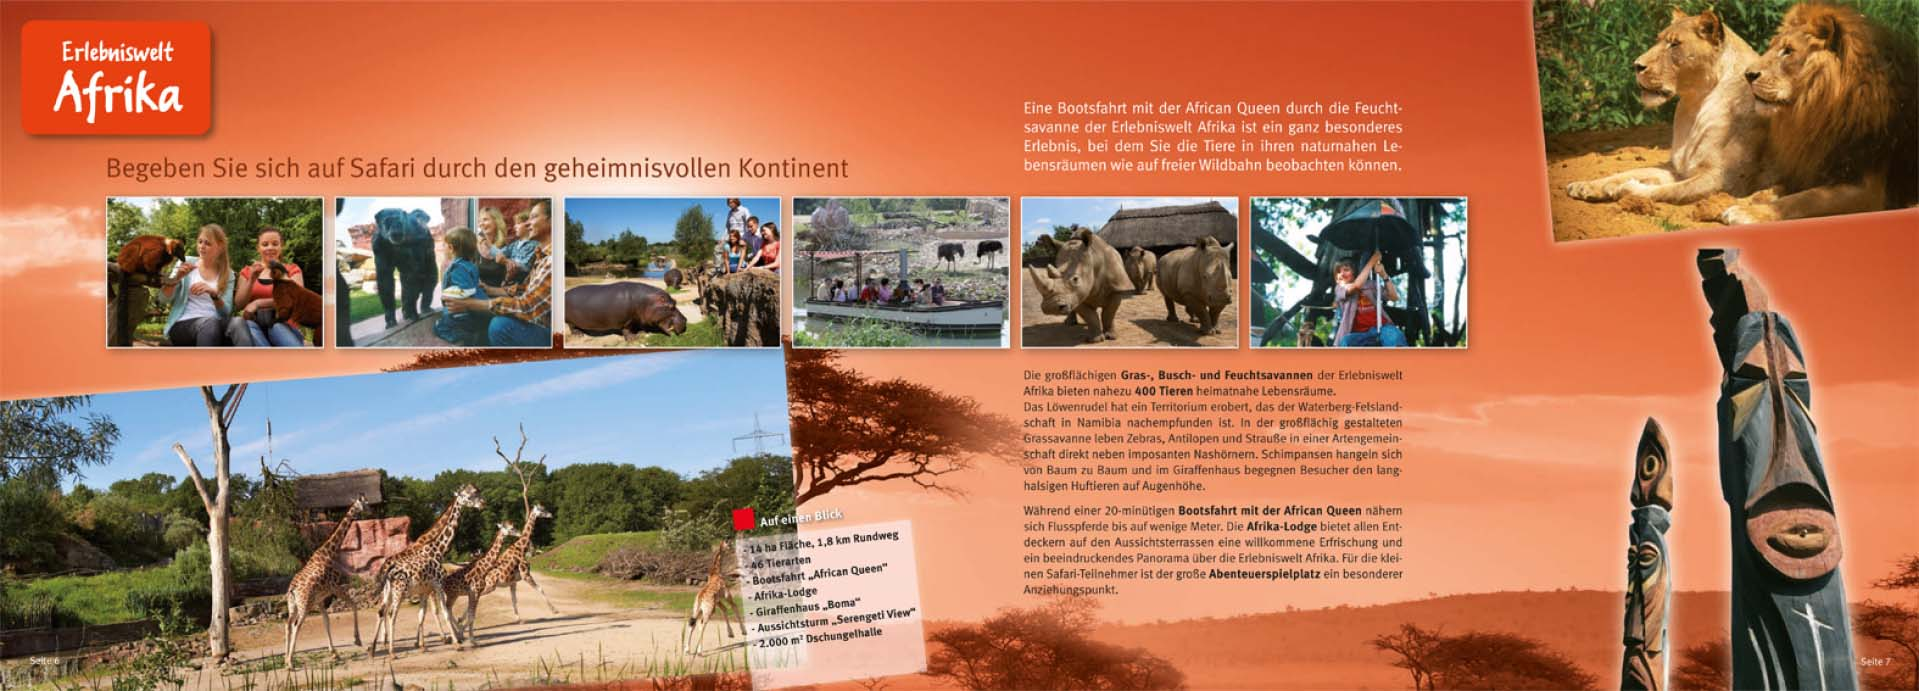 Erlebniswelt Afrika, Inhalt der Gruppenbroschüre der ZOOM Erlebniswelt